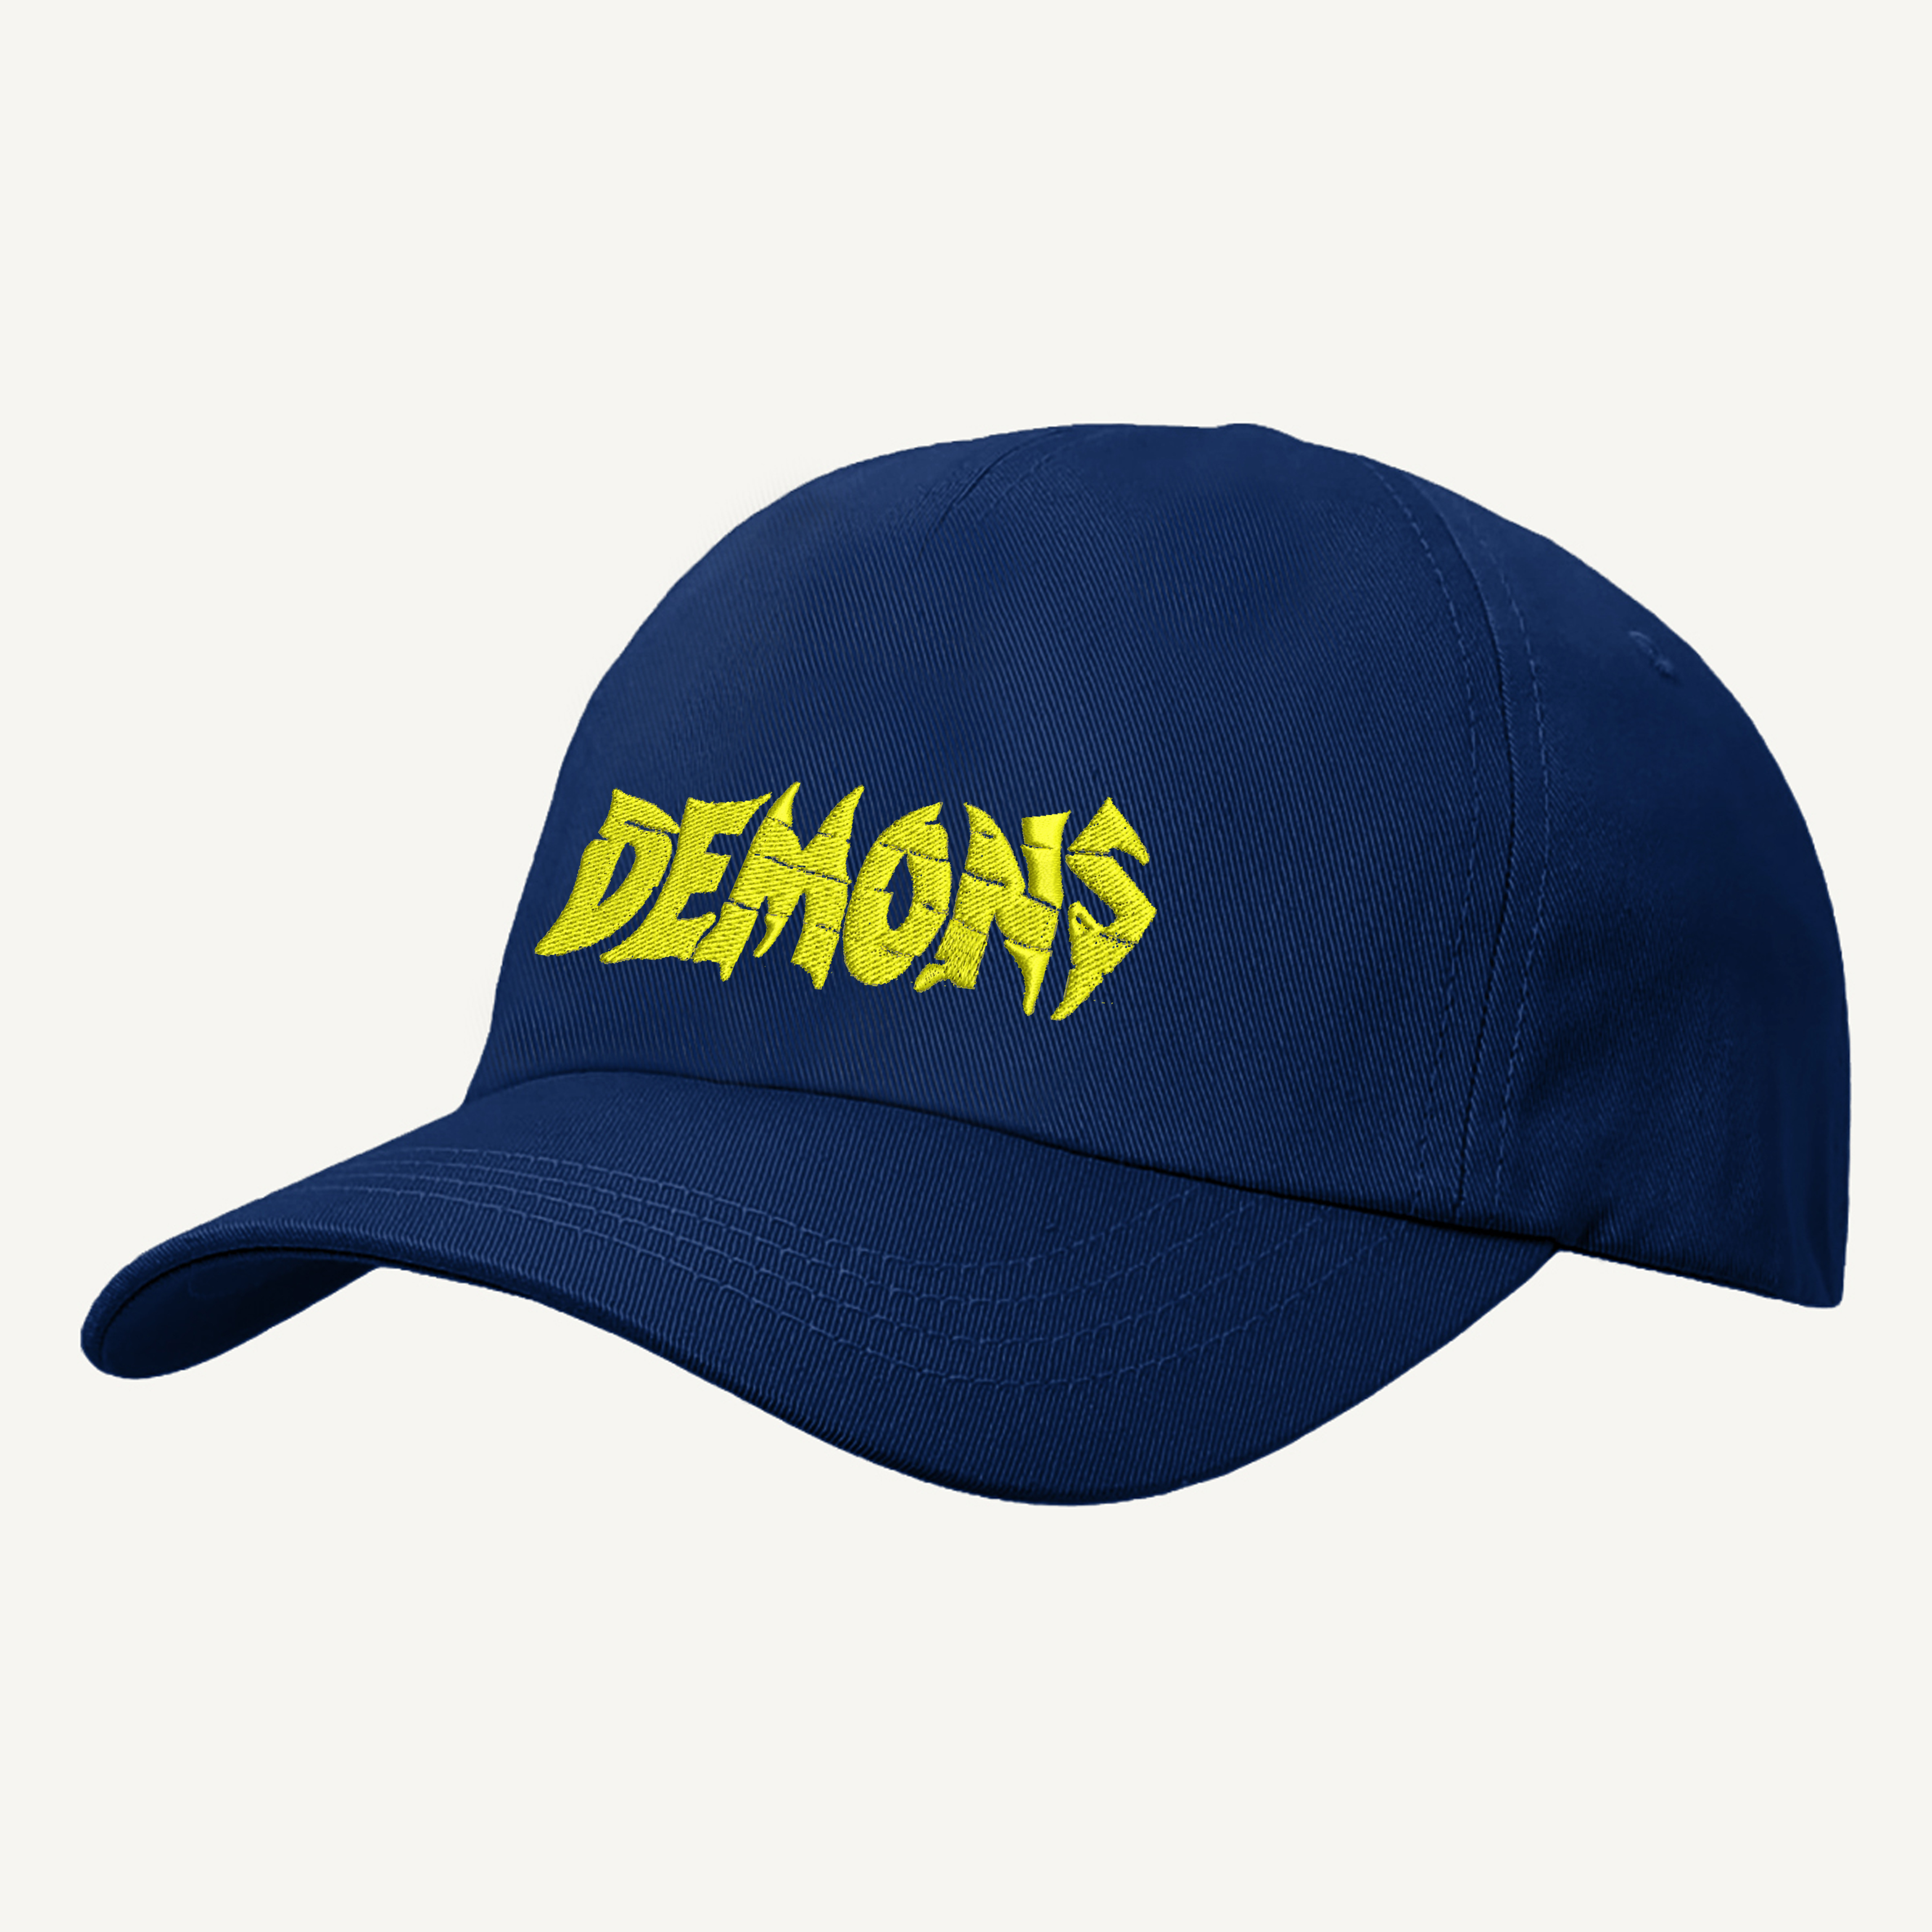 Demonios-Gorra-de-beisbol-drama-Sombrero-pelicula-de-terror-diseno-bordado-Lamberto-Bava